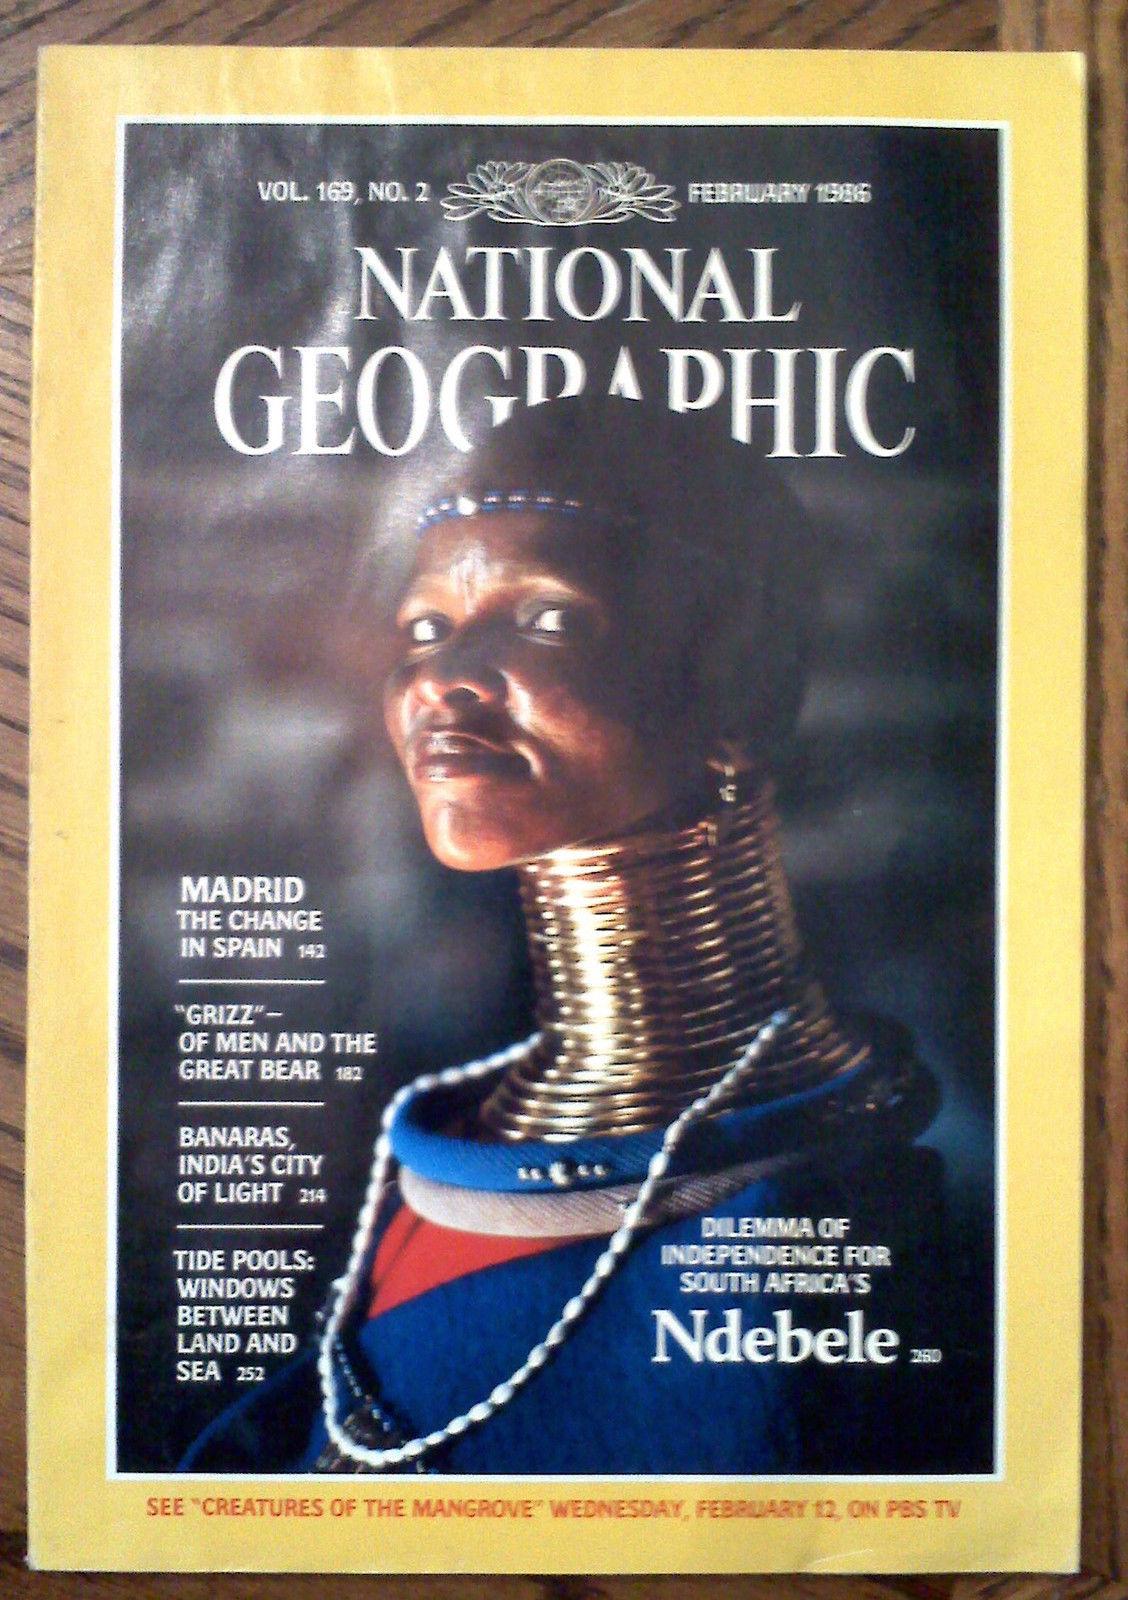 Feb 1986 NATIONAL GEOGRAPHIC Magazine MADRID GRIZZLY BEARS BANARAS NDEBELE - $8.85